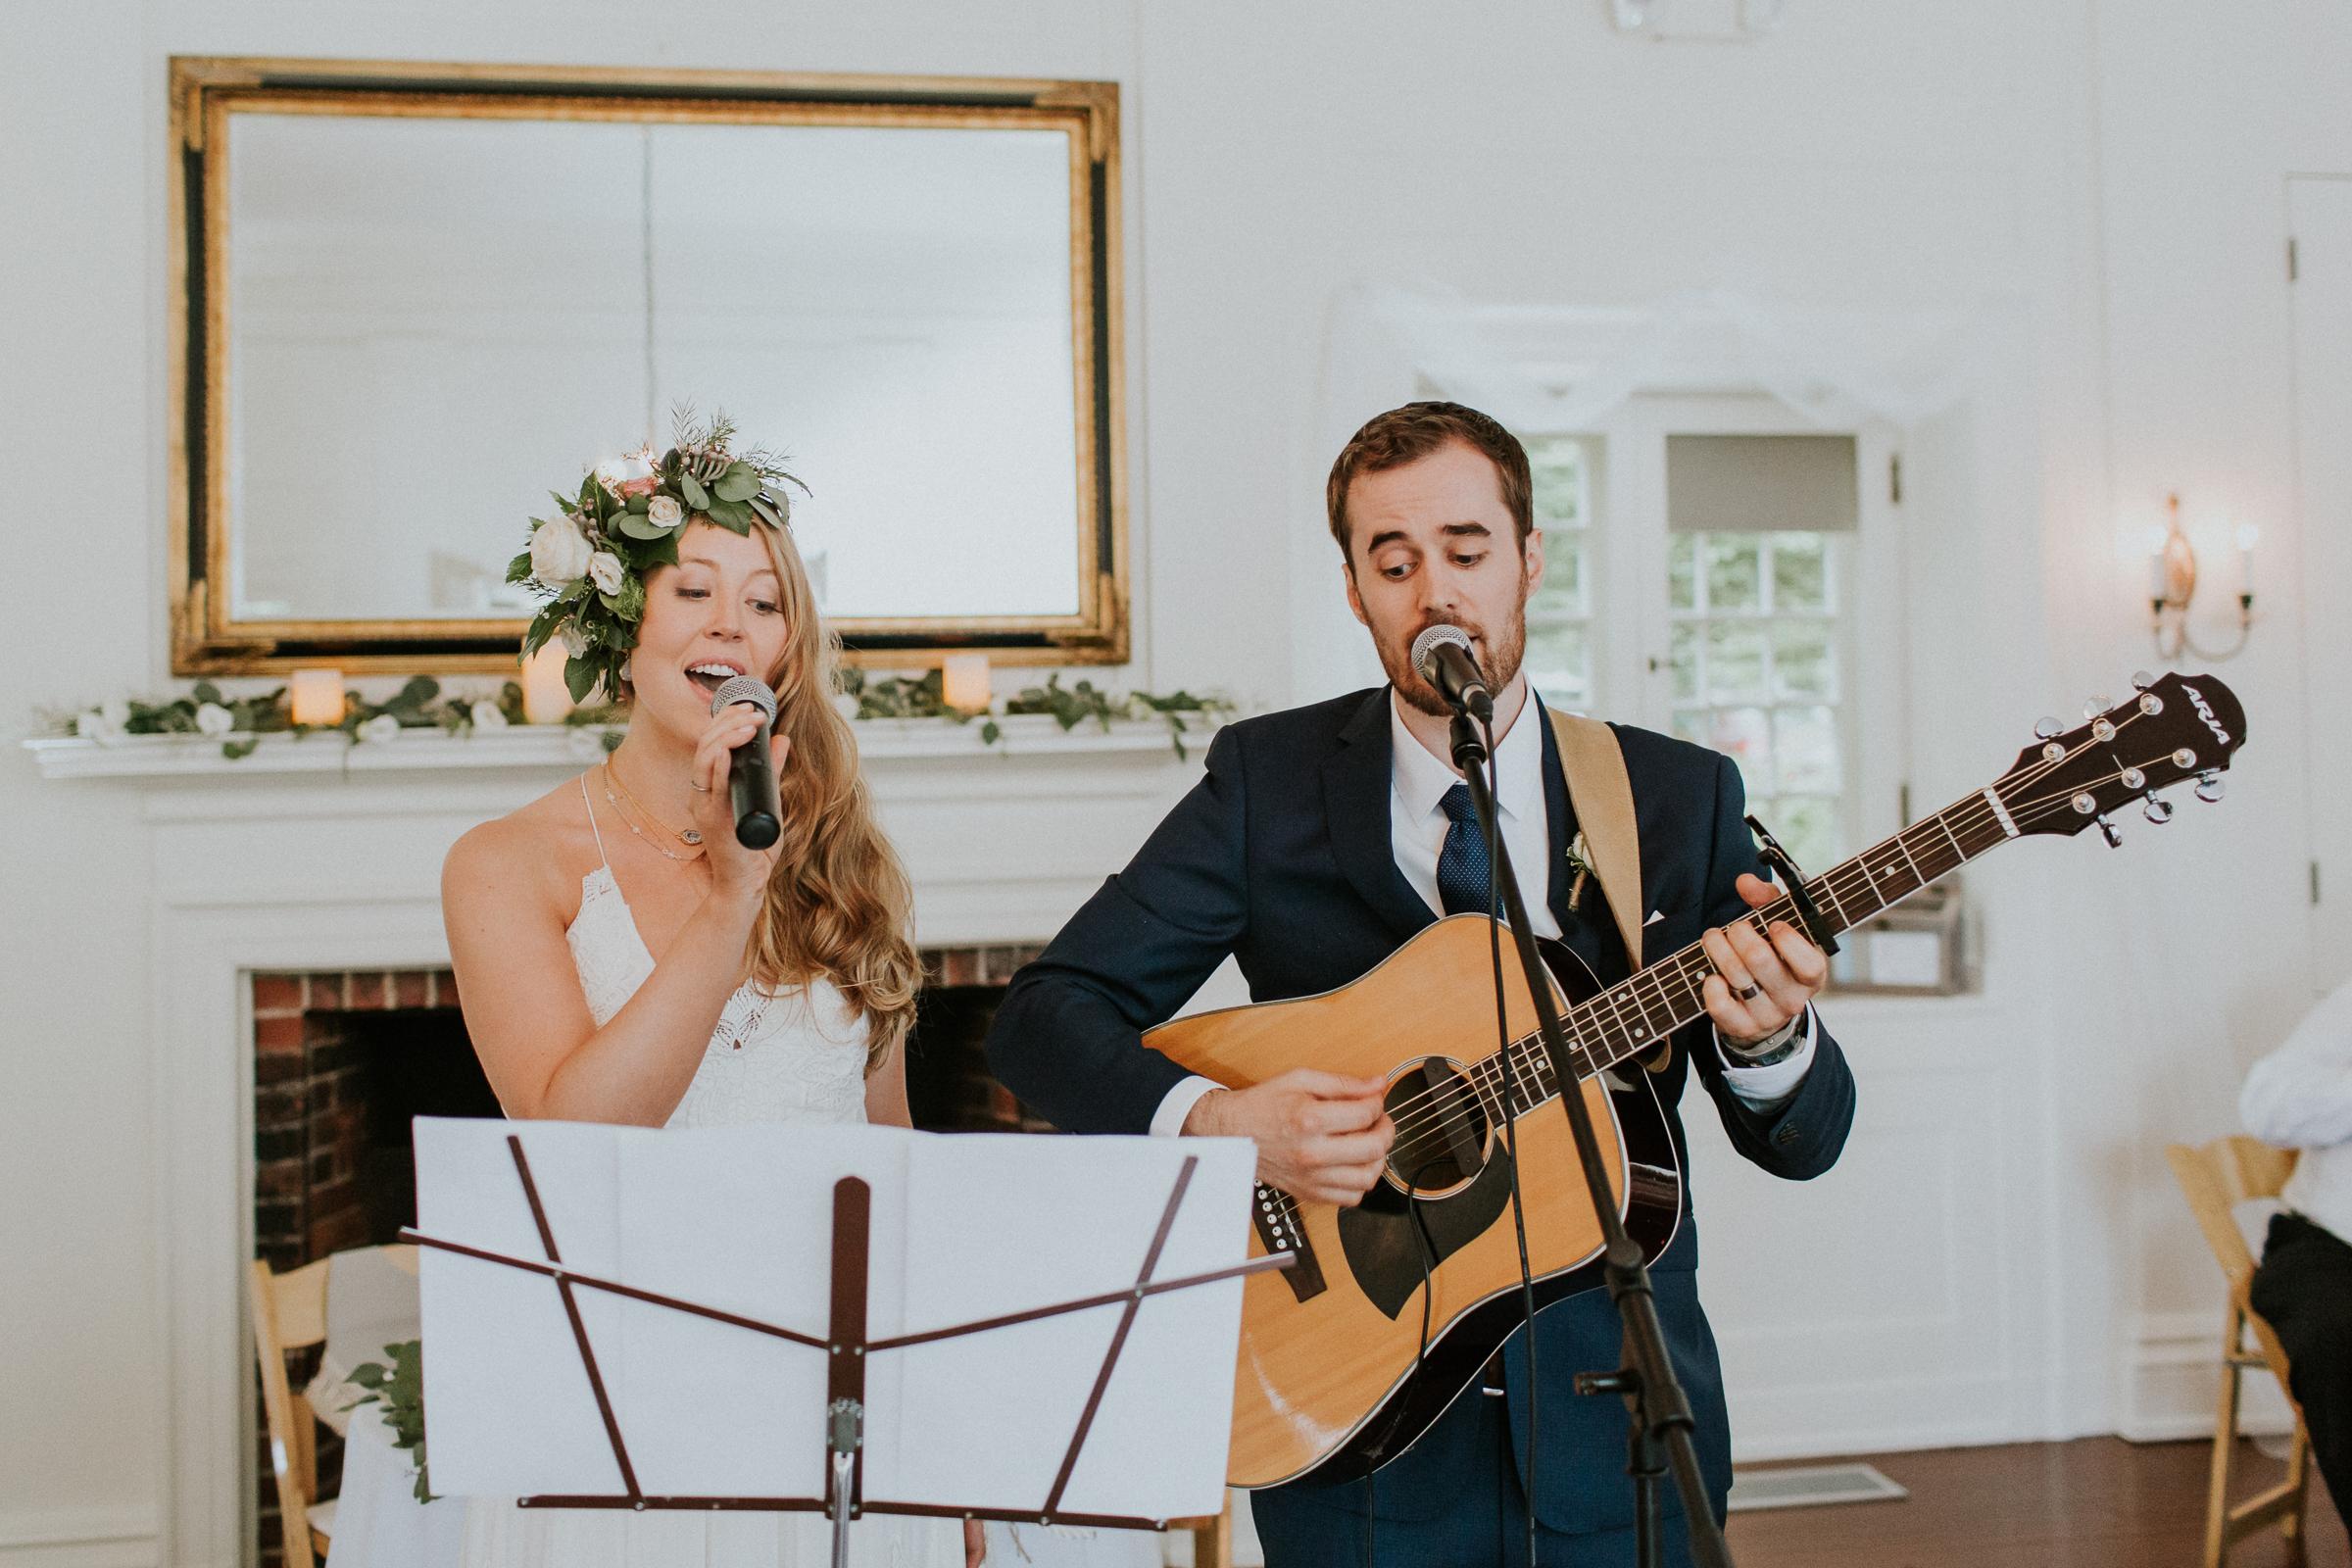 New-York-Documentary-Wedding-Photography-Best-Of-2017-by-Elvira-Kalviste-Photography-41.jpg